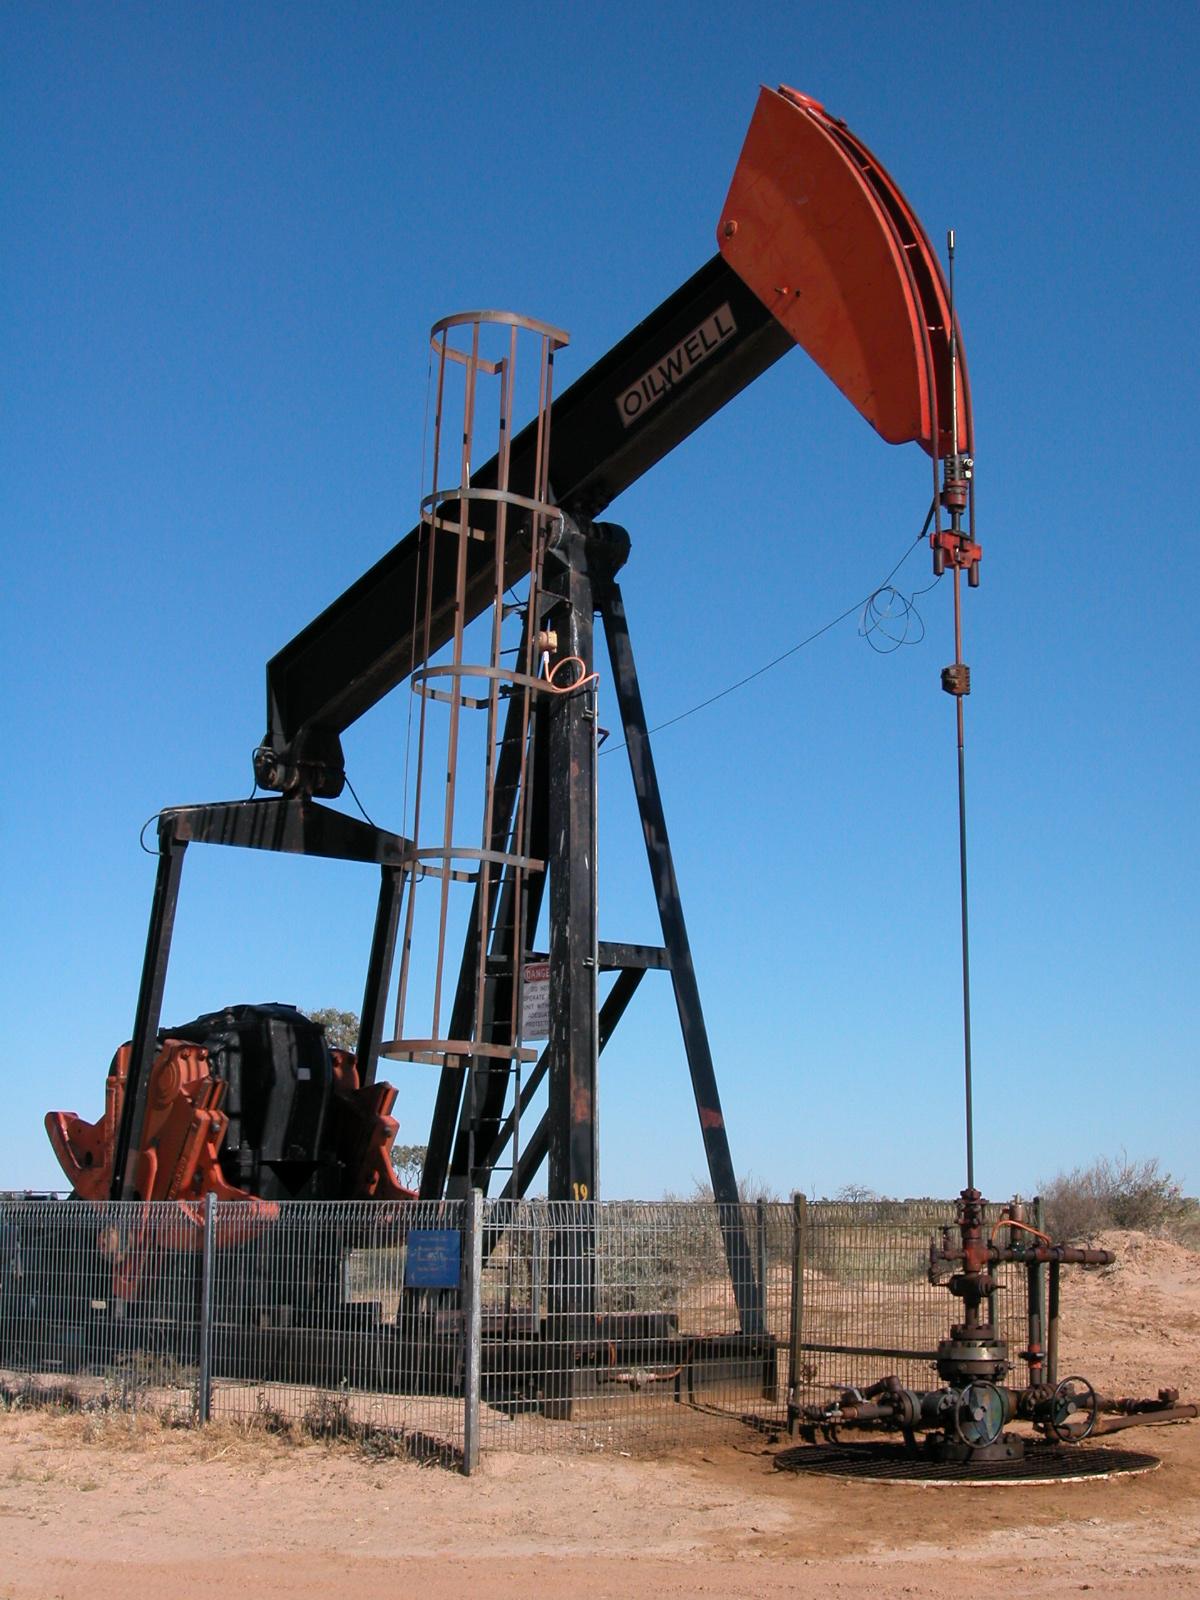 Oil Rig clipart oil derrick #8